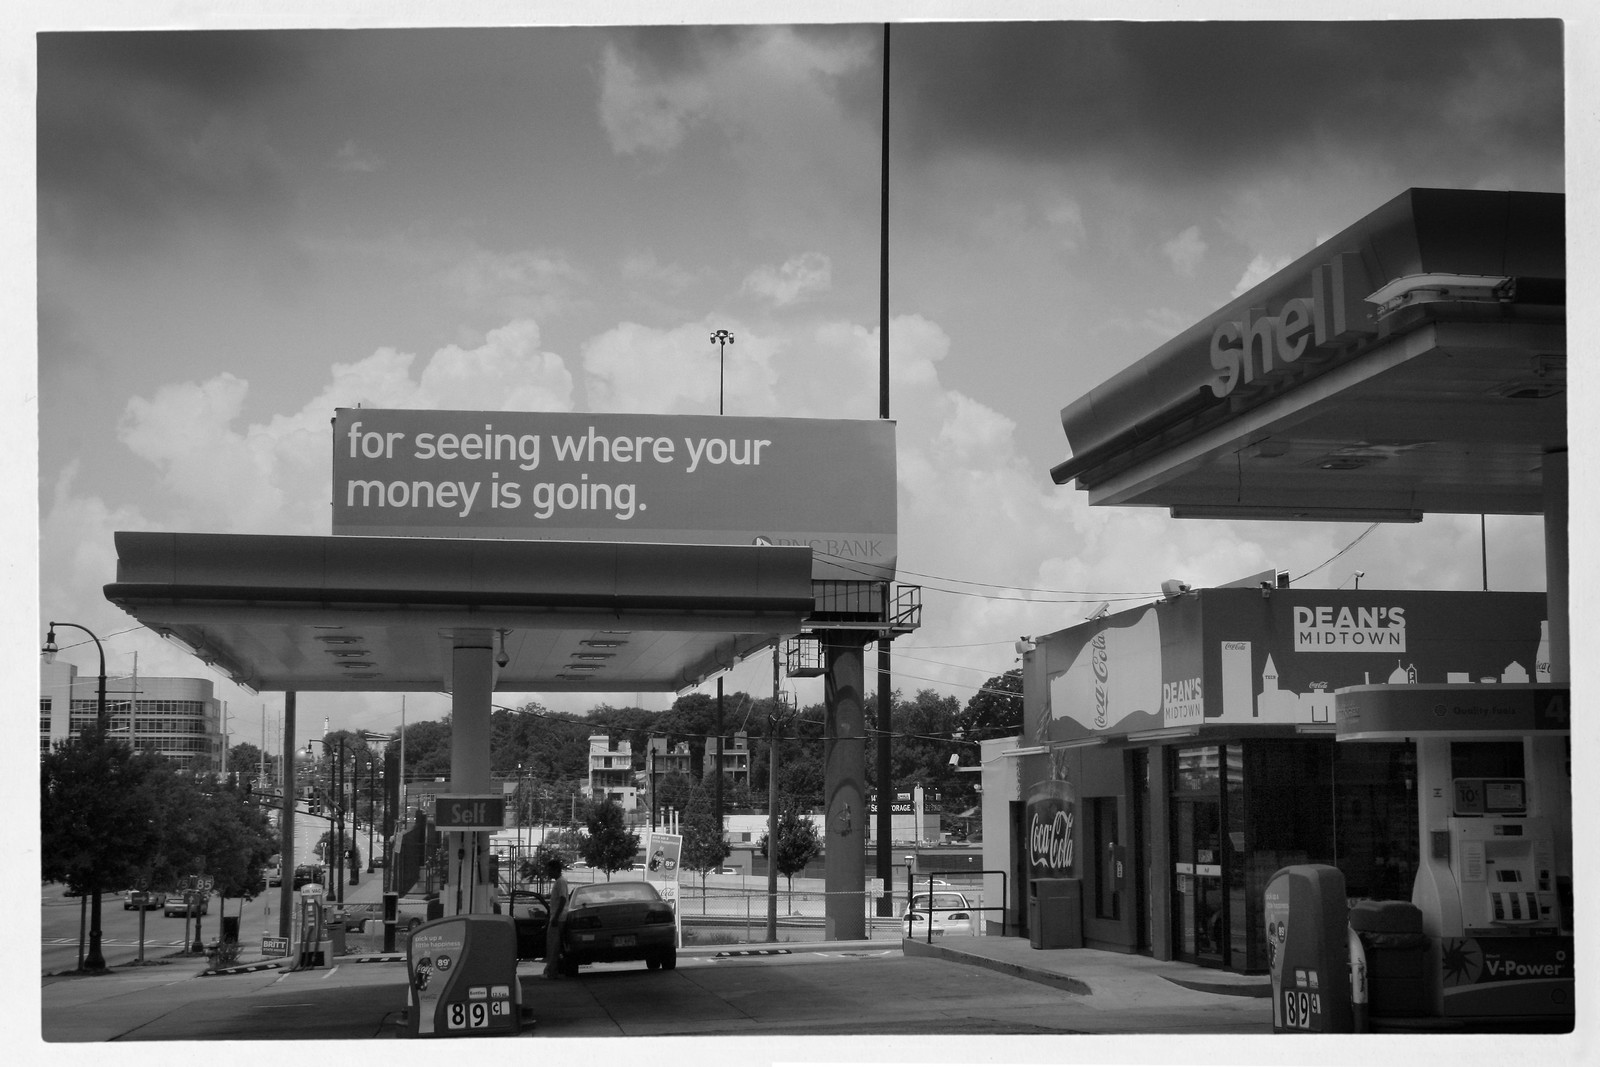 Dean's Midtown Shell Station, Atlanta